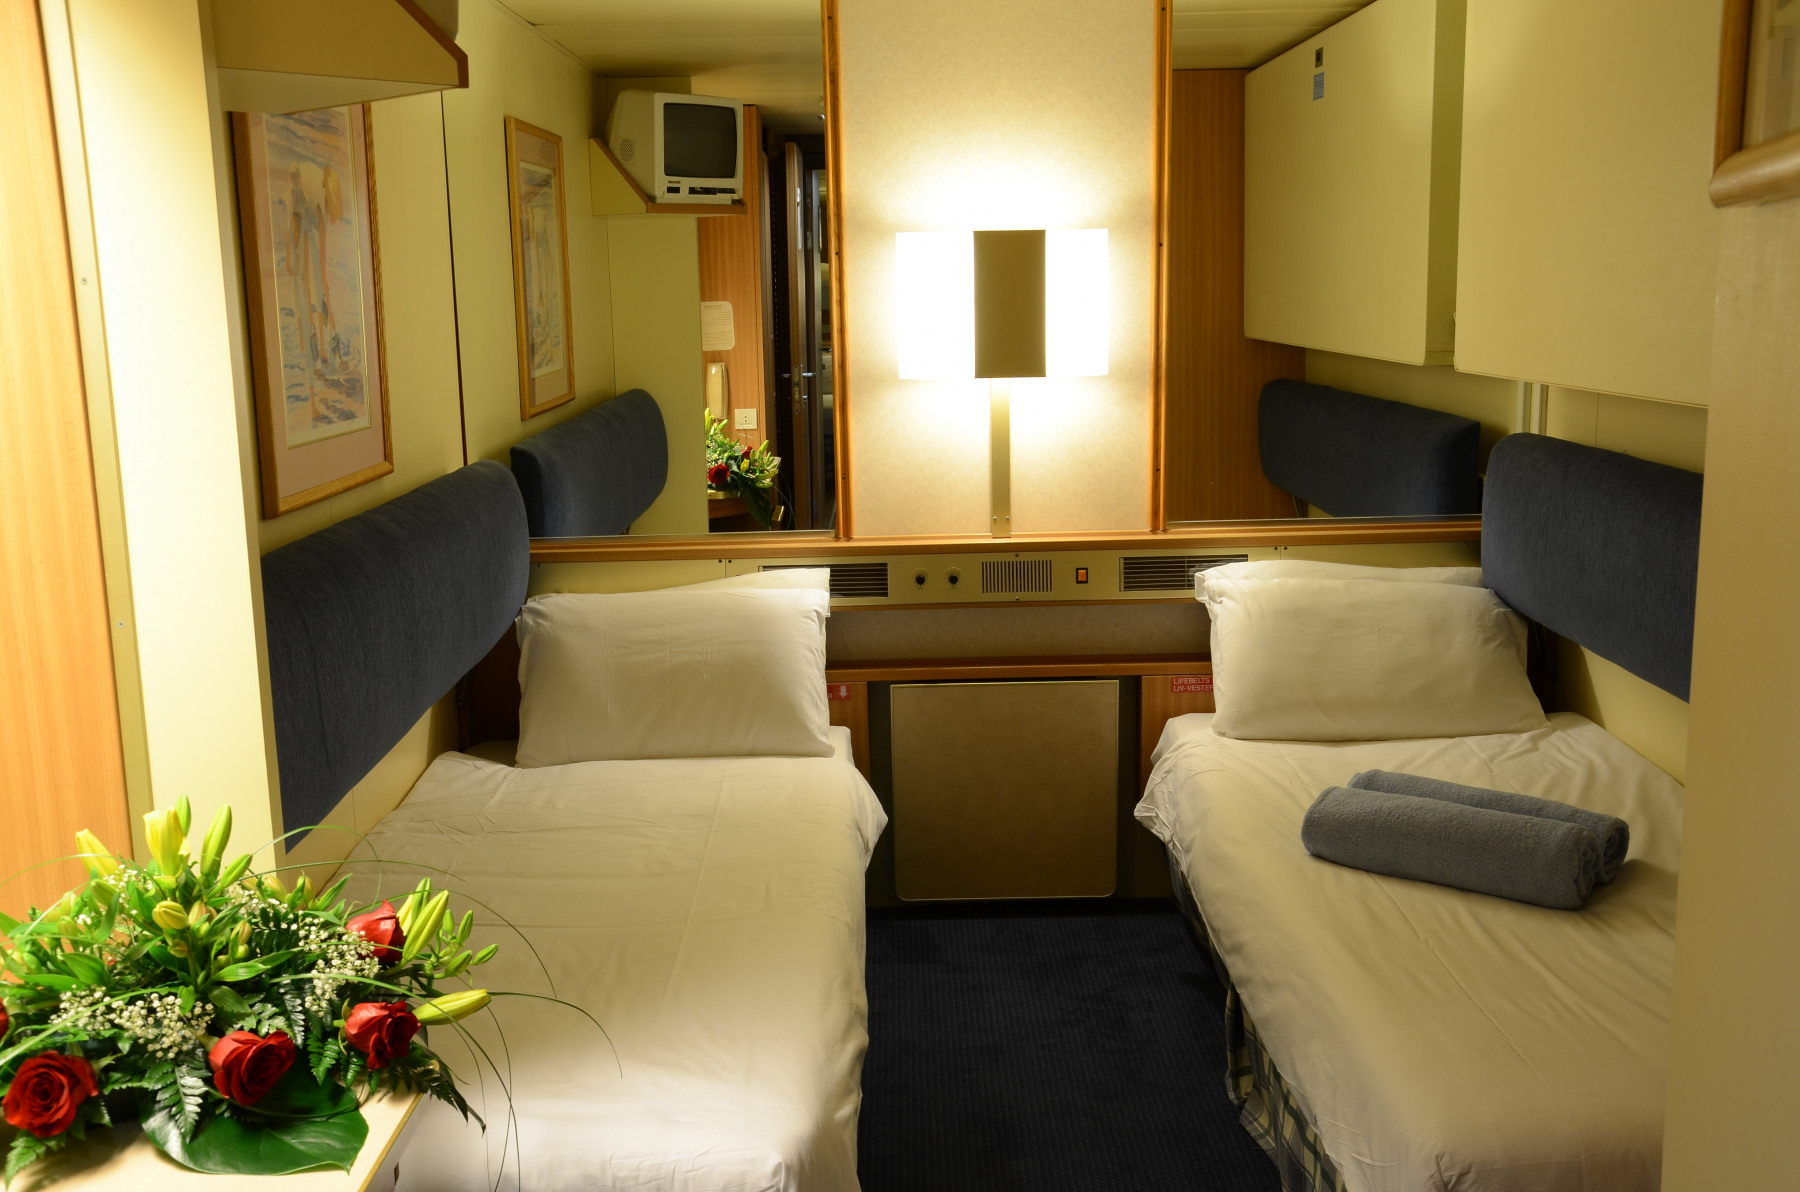 Celestyal Cruises Celestyal Olympia Accommodation Inside Cabin 2.JPG